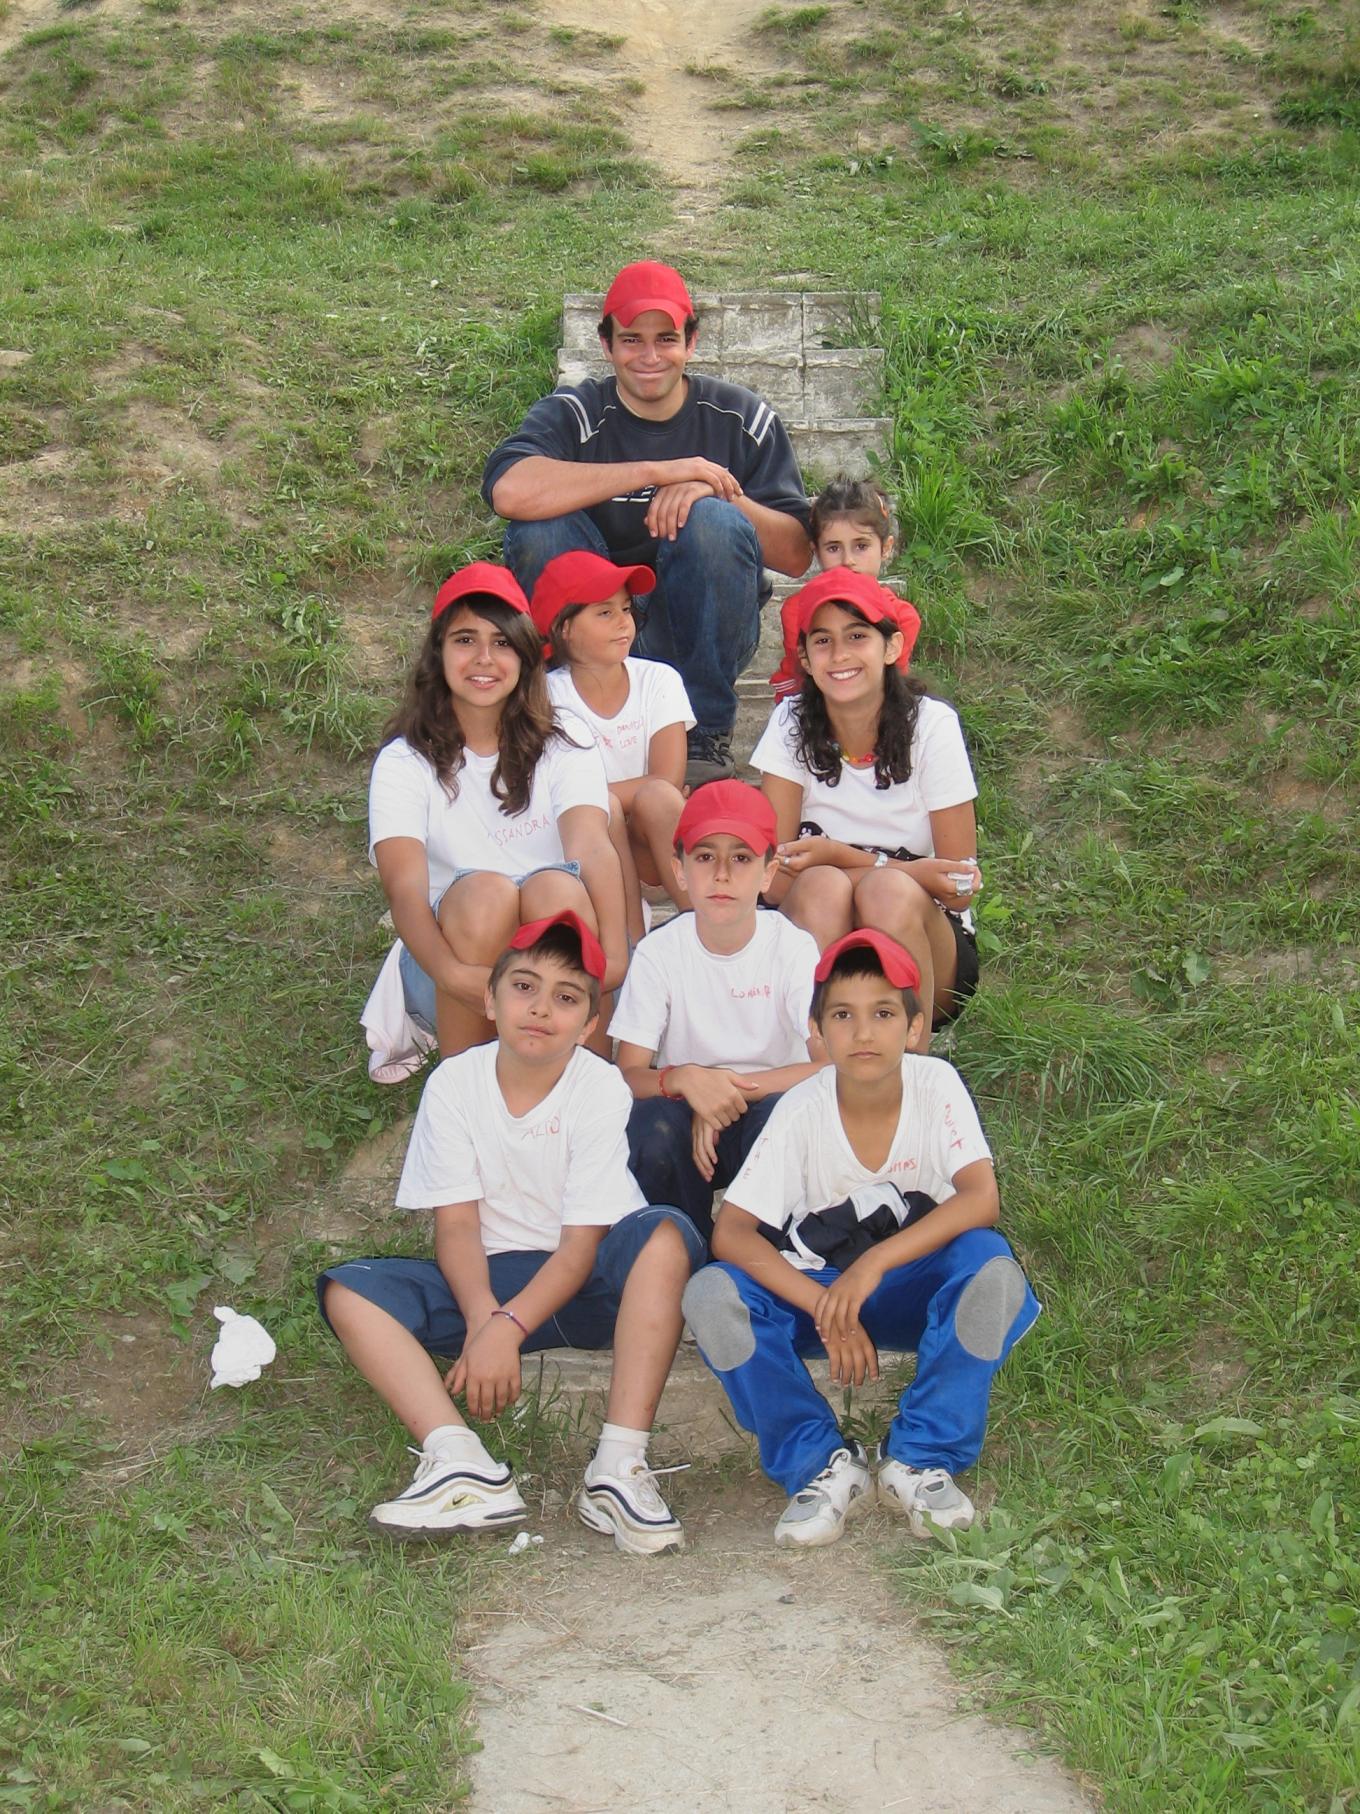 Campo_San_Giacomo_squadre-2009-07-10--20.07.02